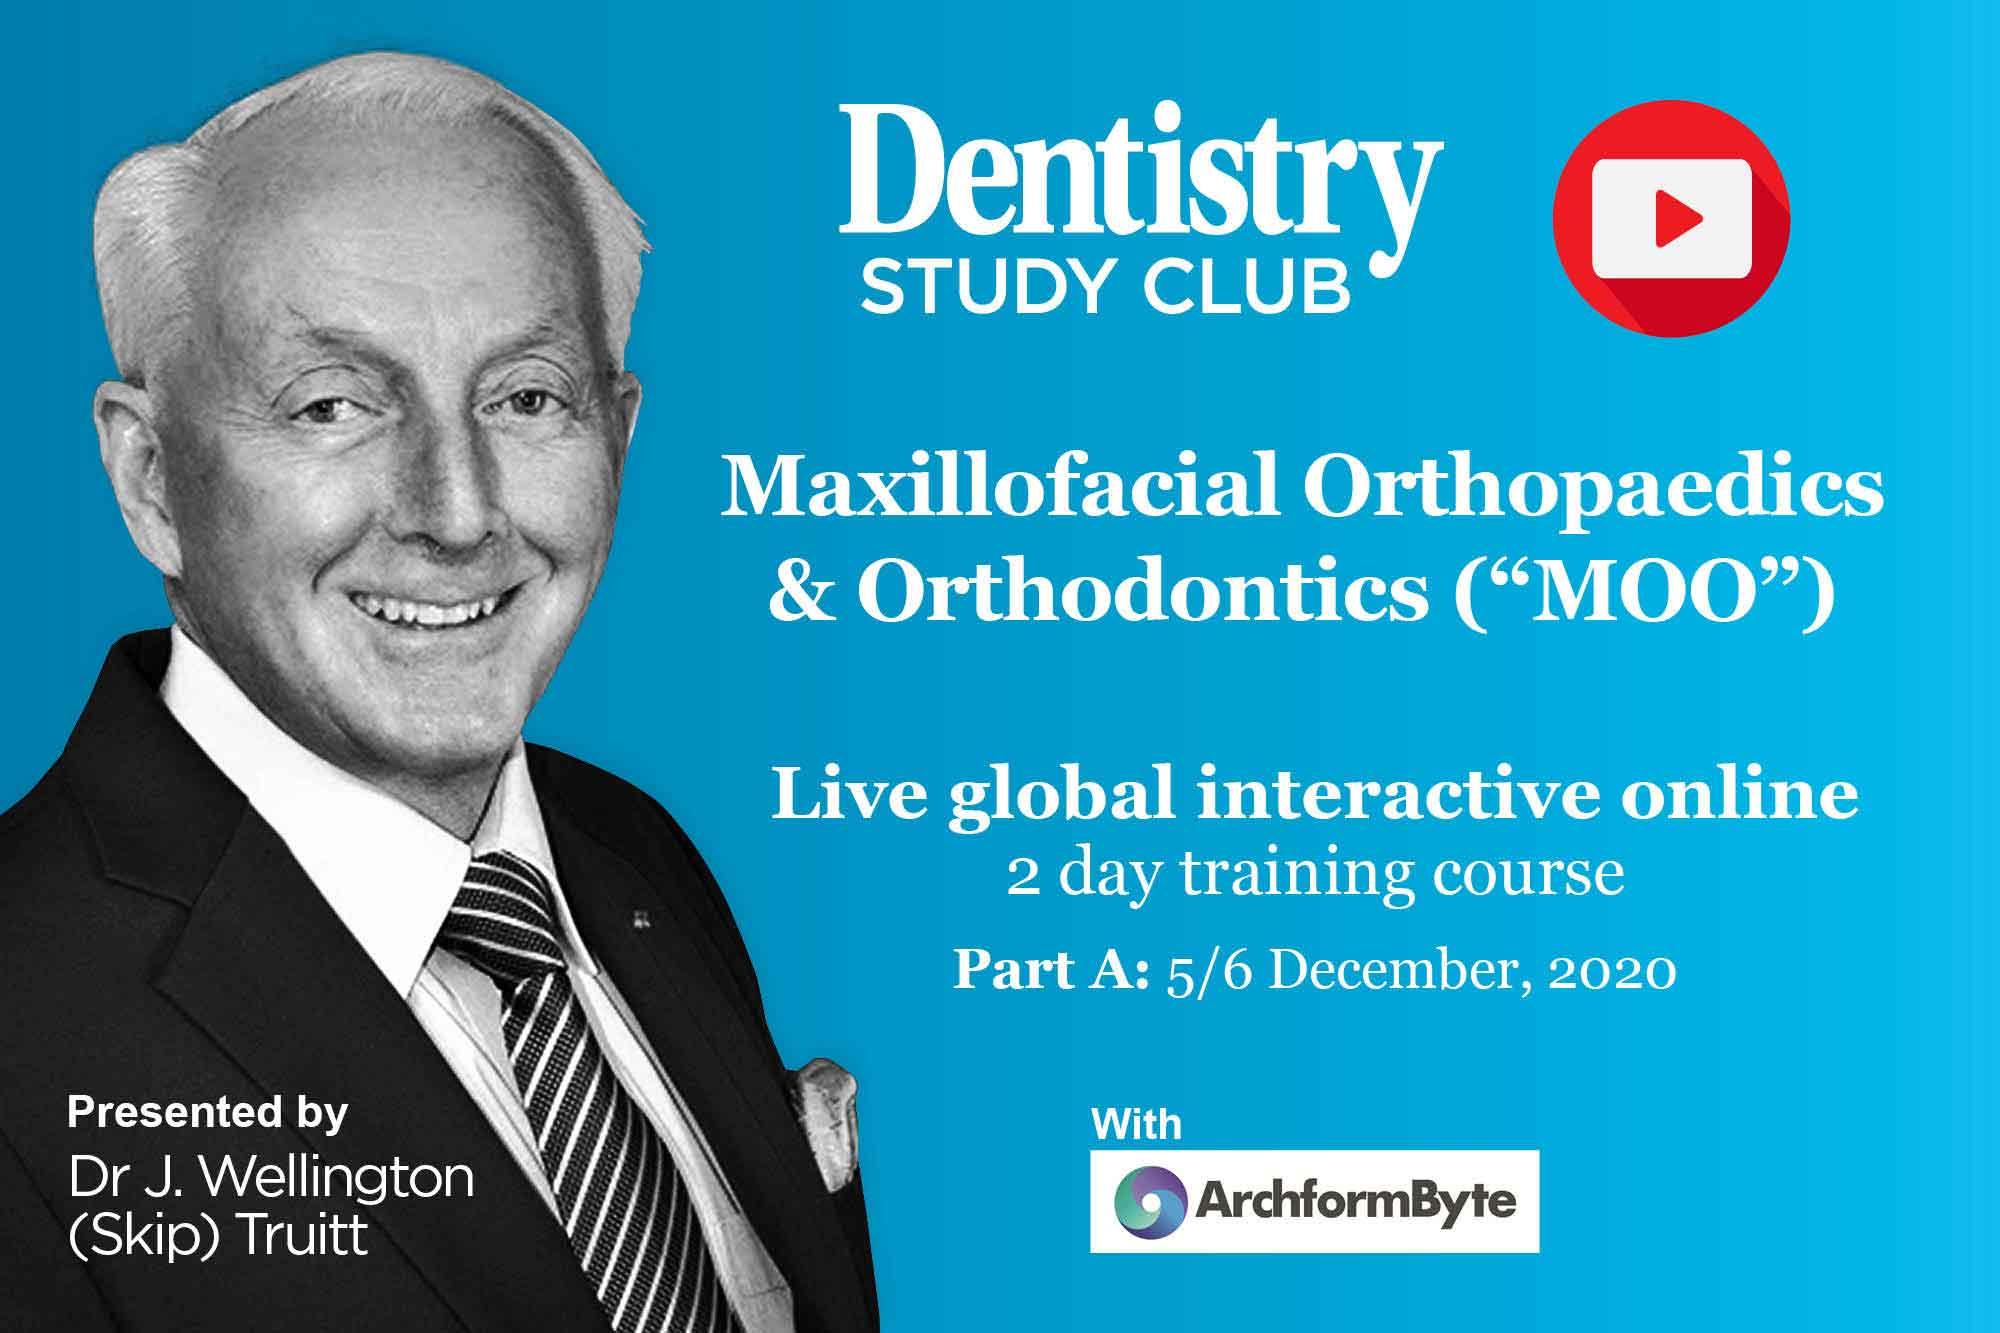 Maxillofacial orthopaedics and orthodontics with Skip Truitt